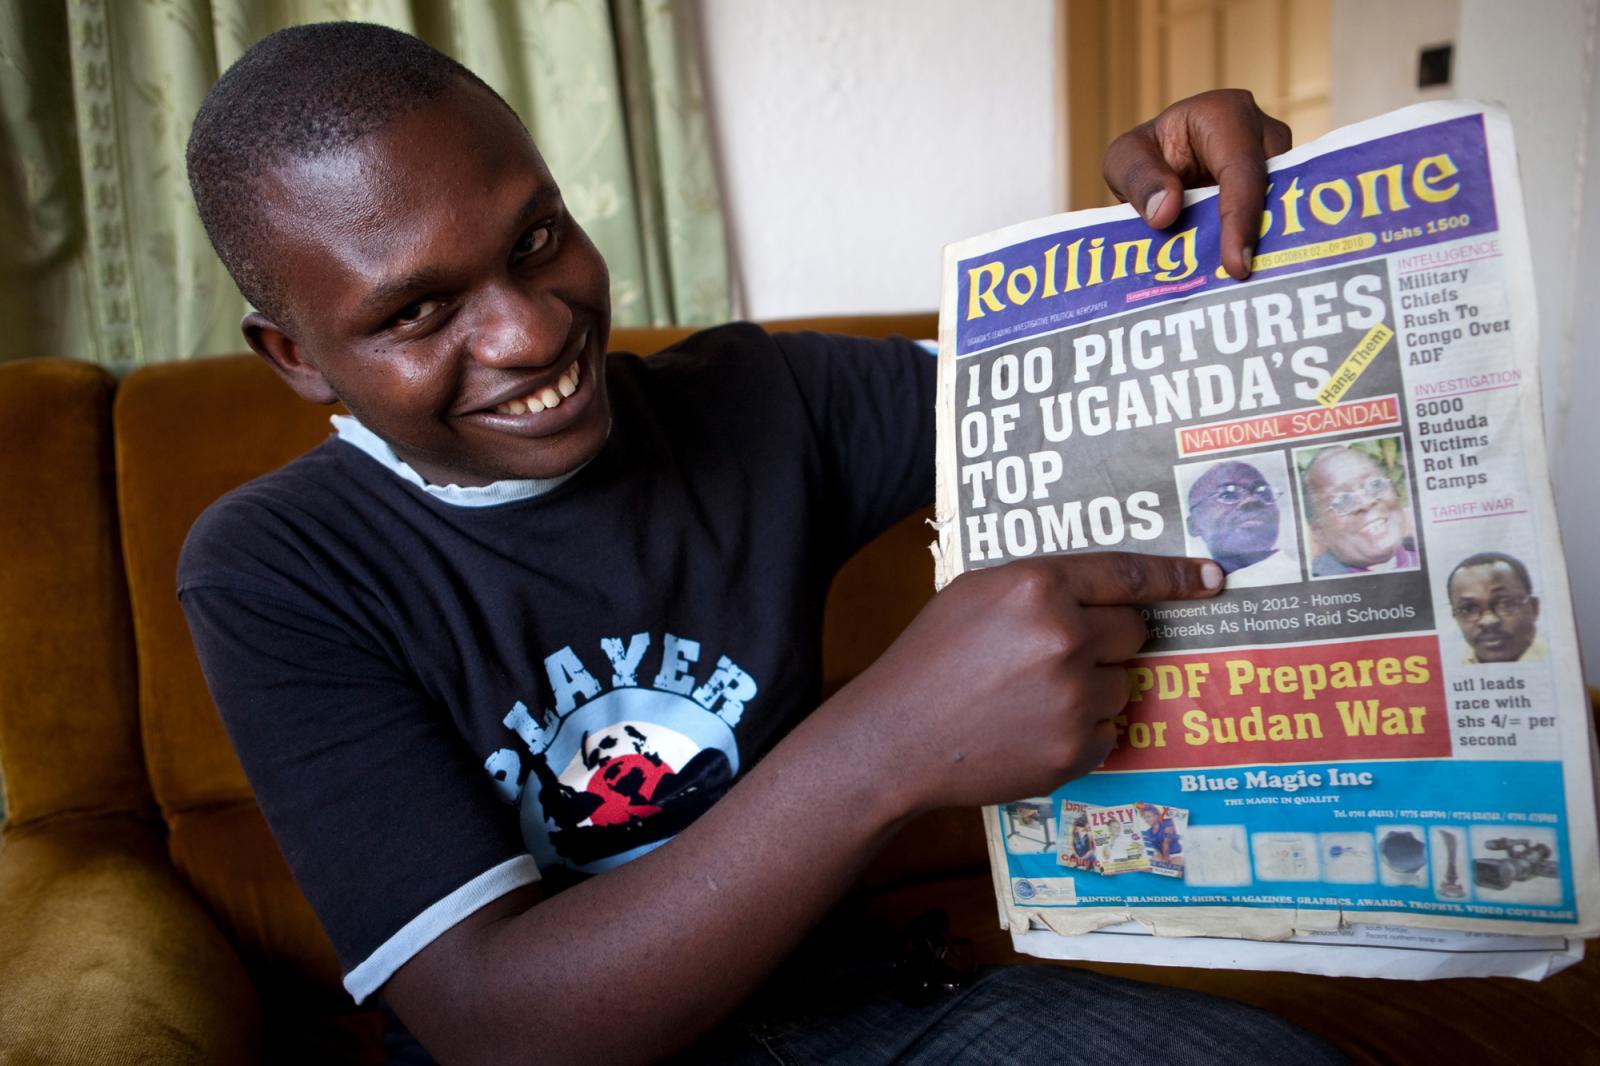 Photography image - Loading UgandaAntiGayBill02.jpg